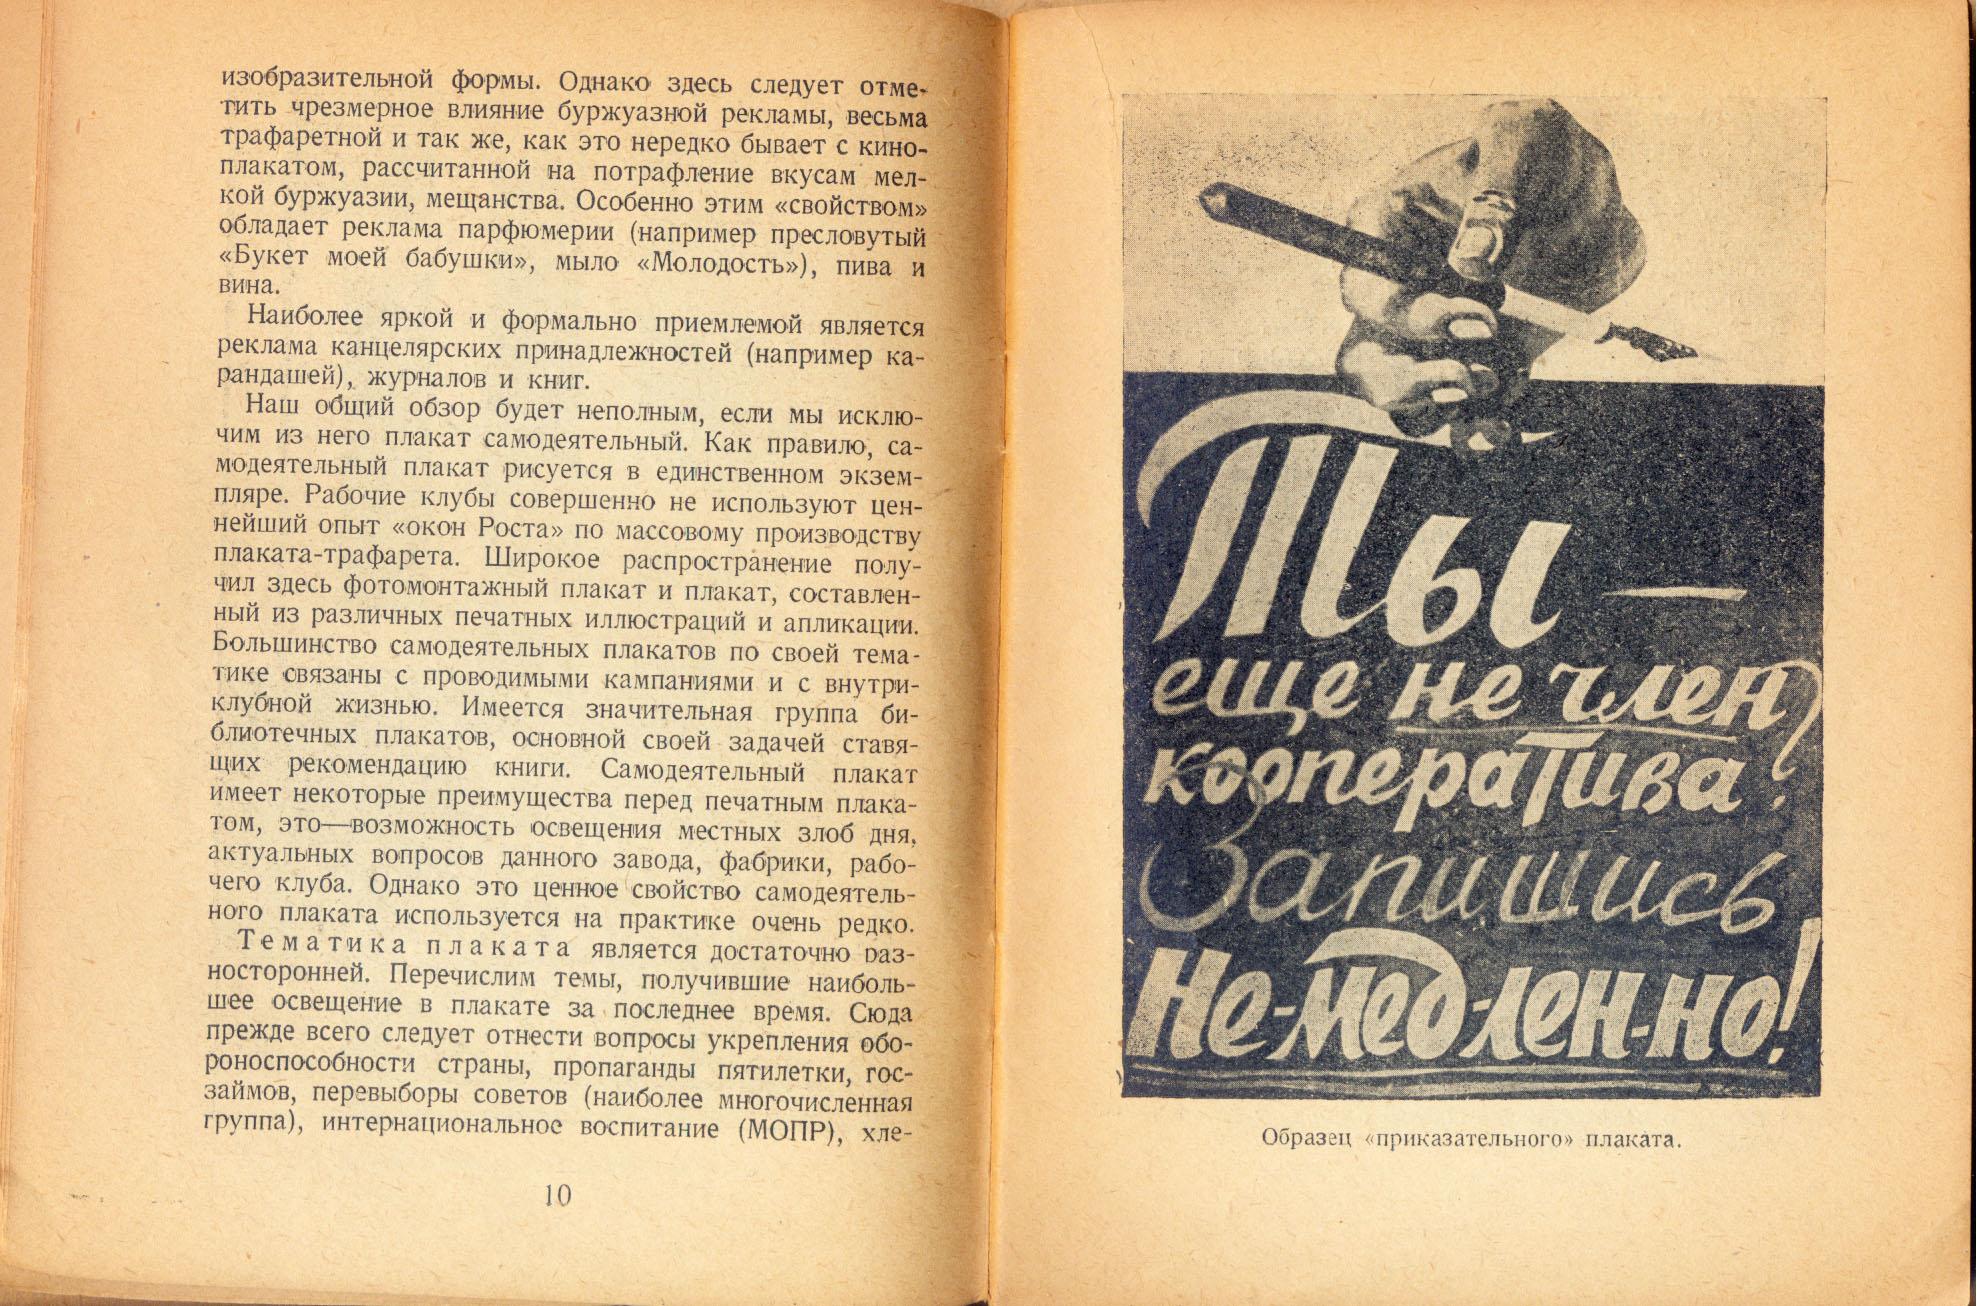 плакат 10.jpg